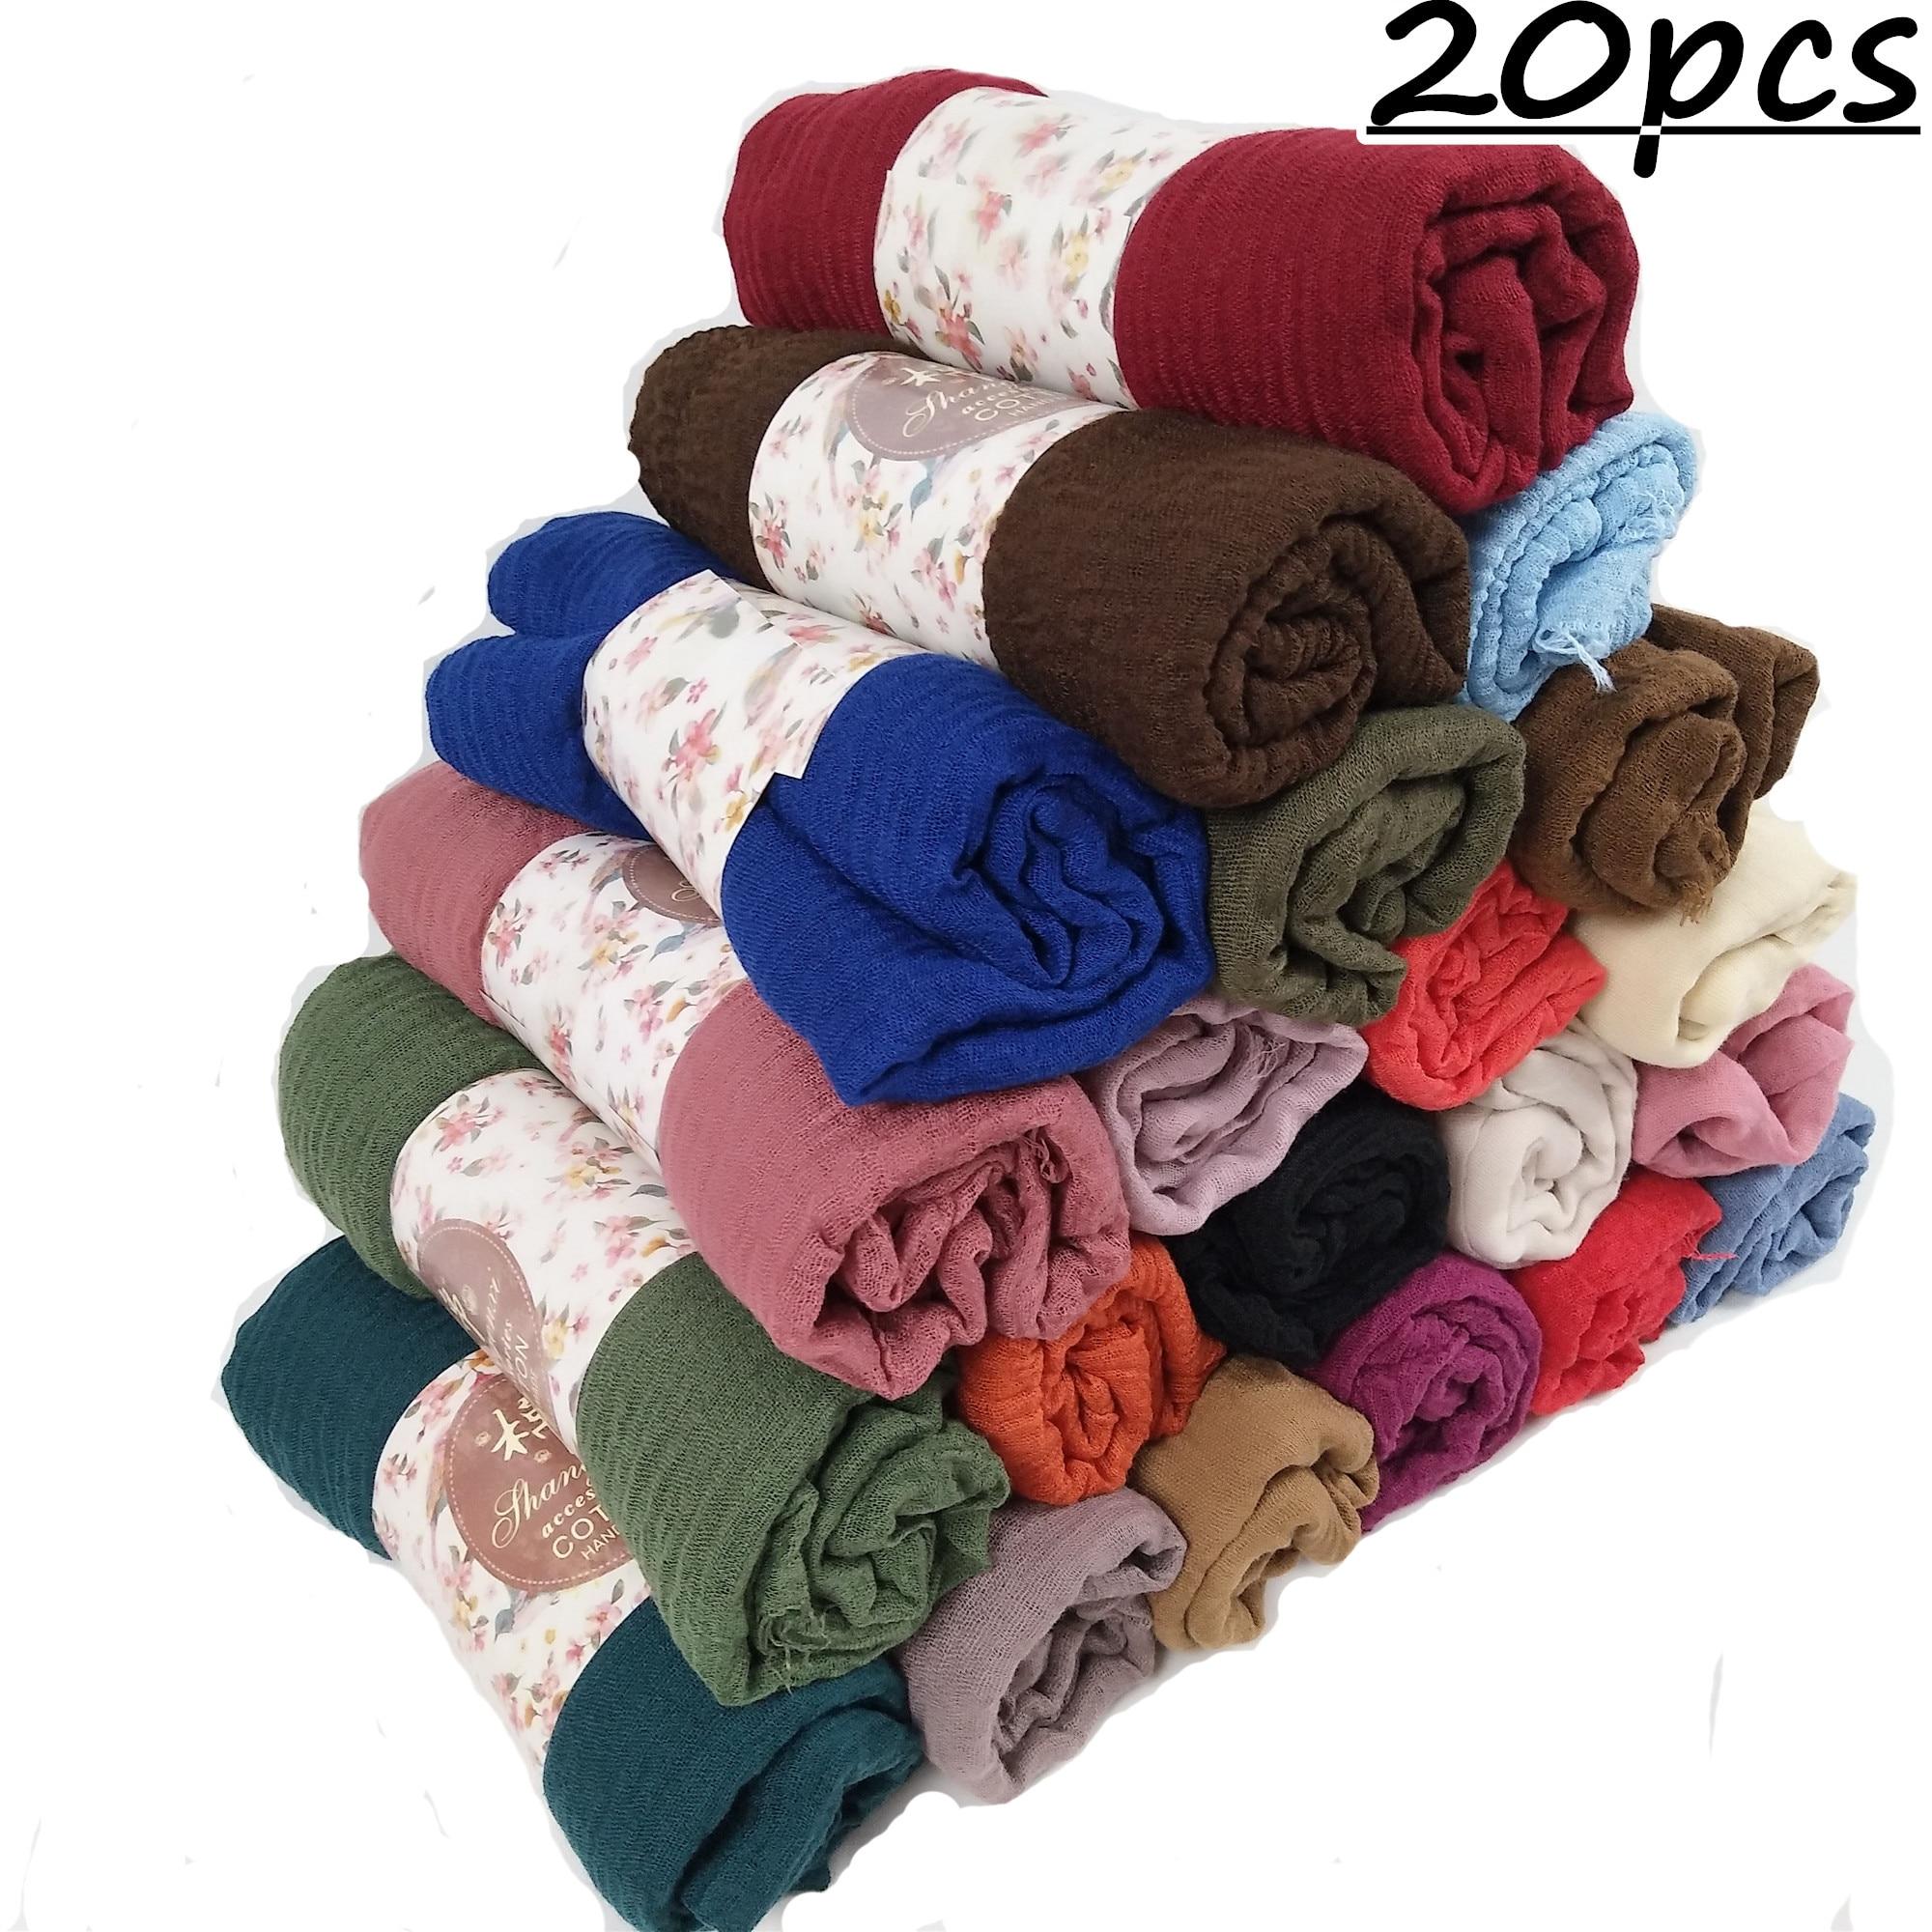 G7 20st 1lot Hot sale crinkle bubble vanlig hijab scarf / scarf rynka vanlig hijab ljuddämpare sjalar stor wrap pashmina